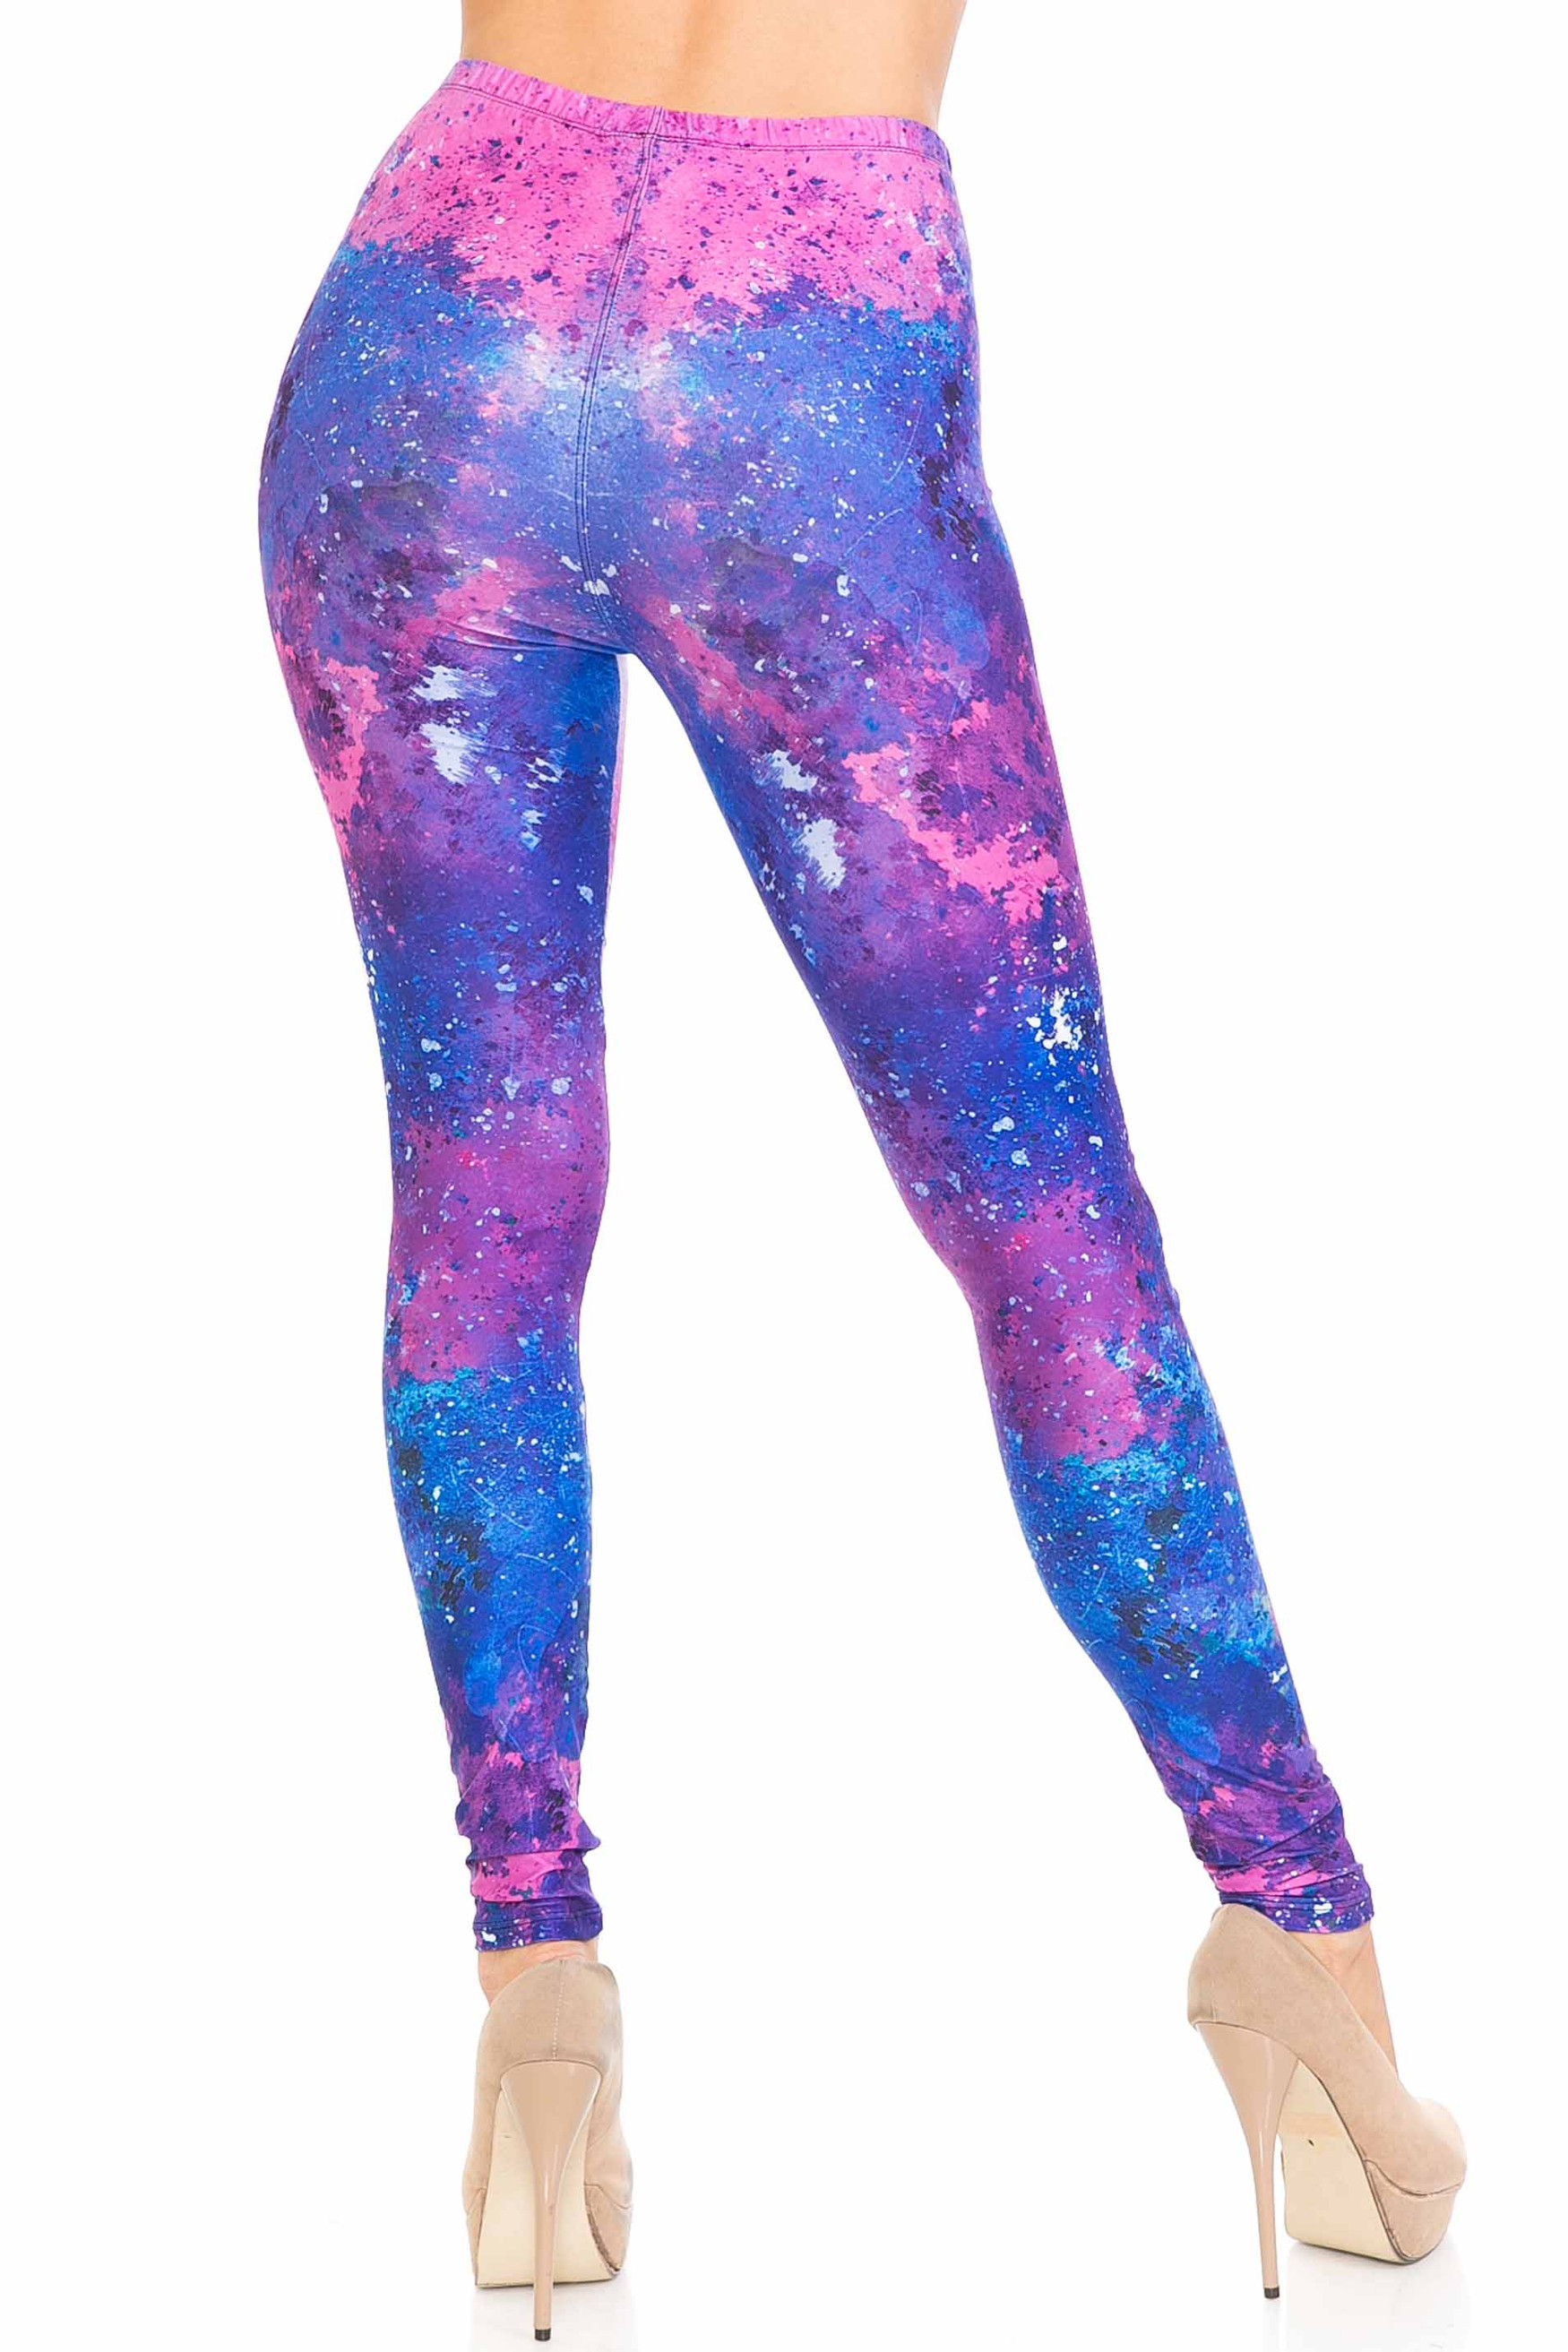 Rear view of Creamy Soft Blue Fuchsia Nebula Leggings - USA Fashion™